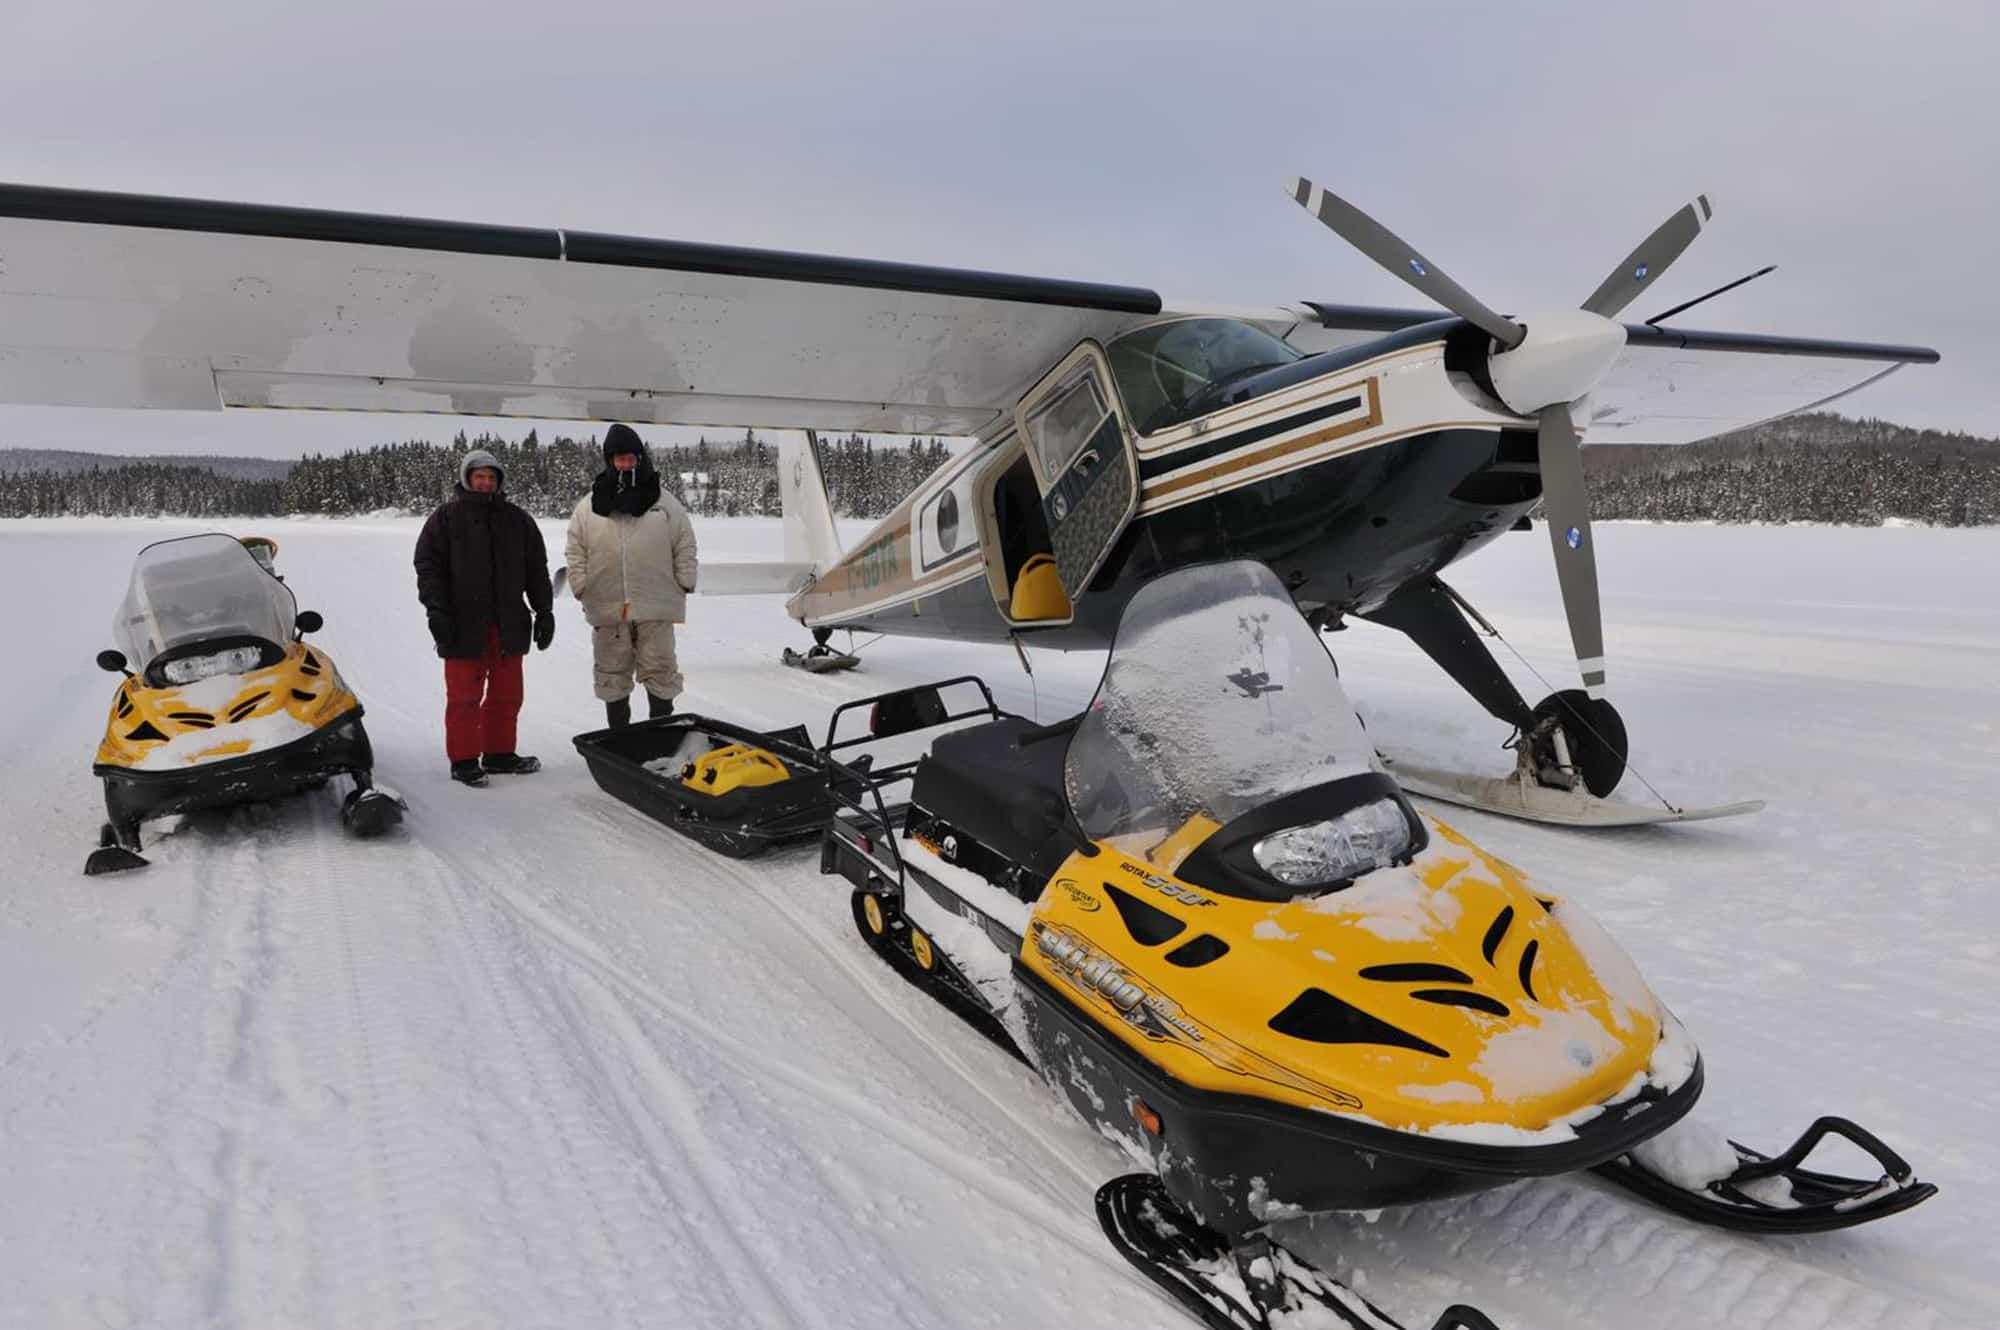 Voyage en motoneige sur le lac Québec